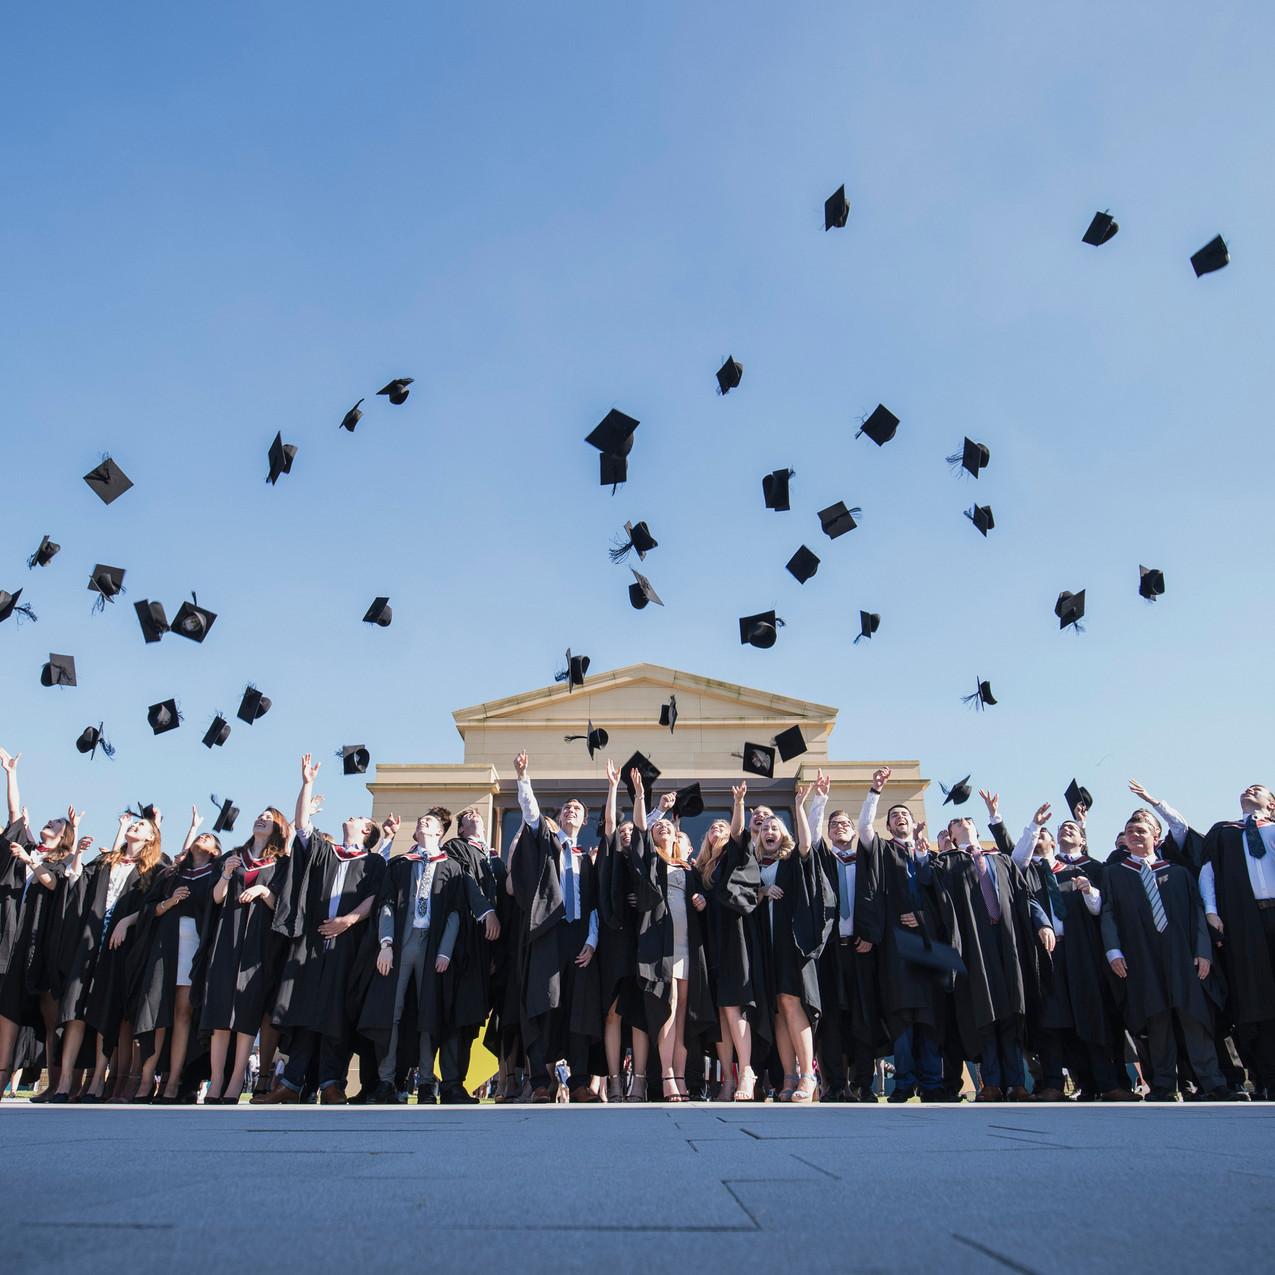 952-graduation-summer 2016 throw hats wi